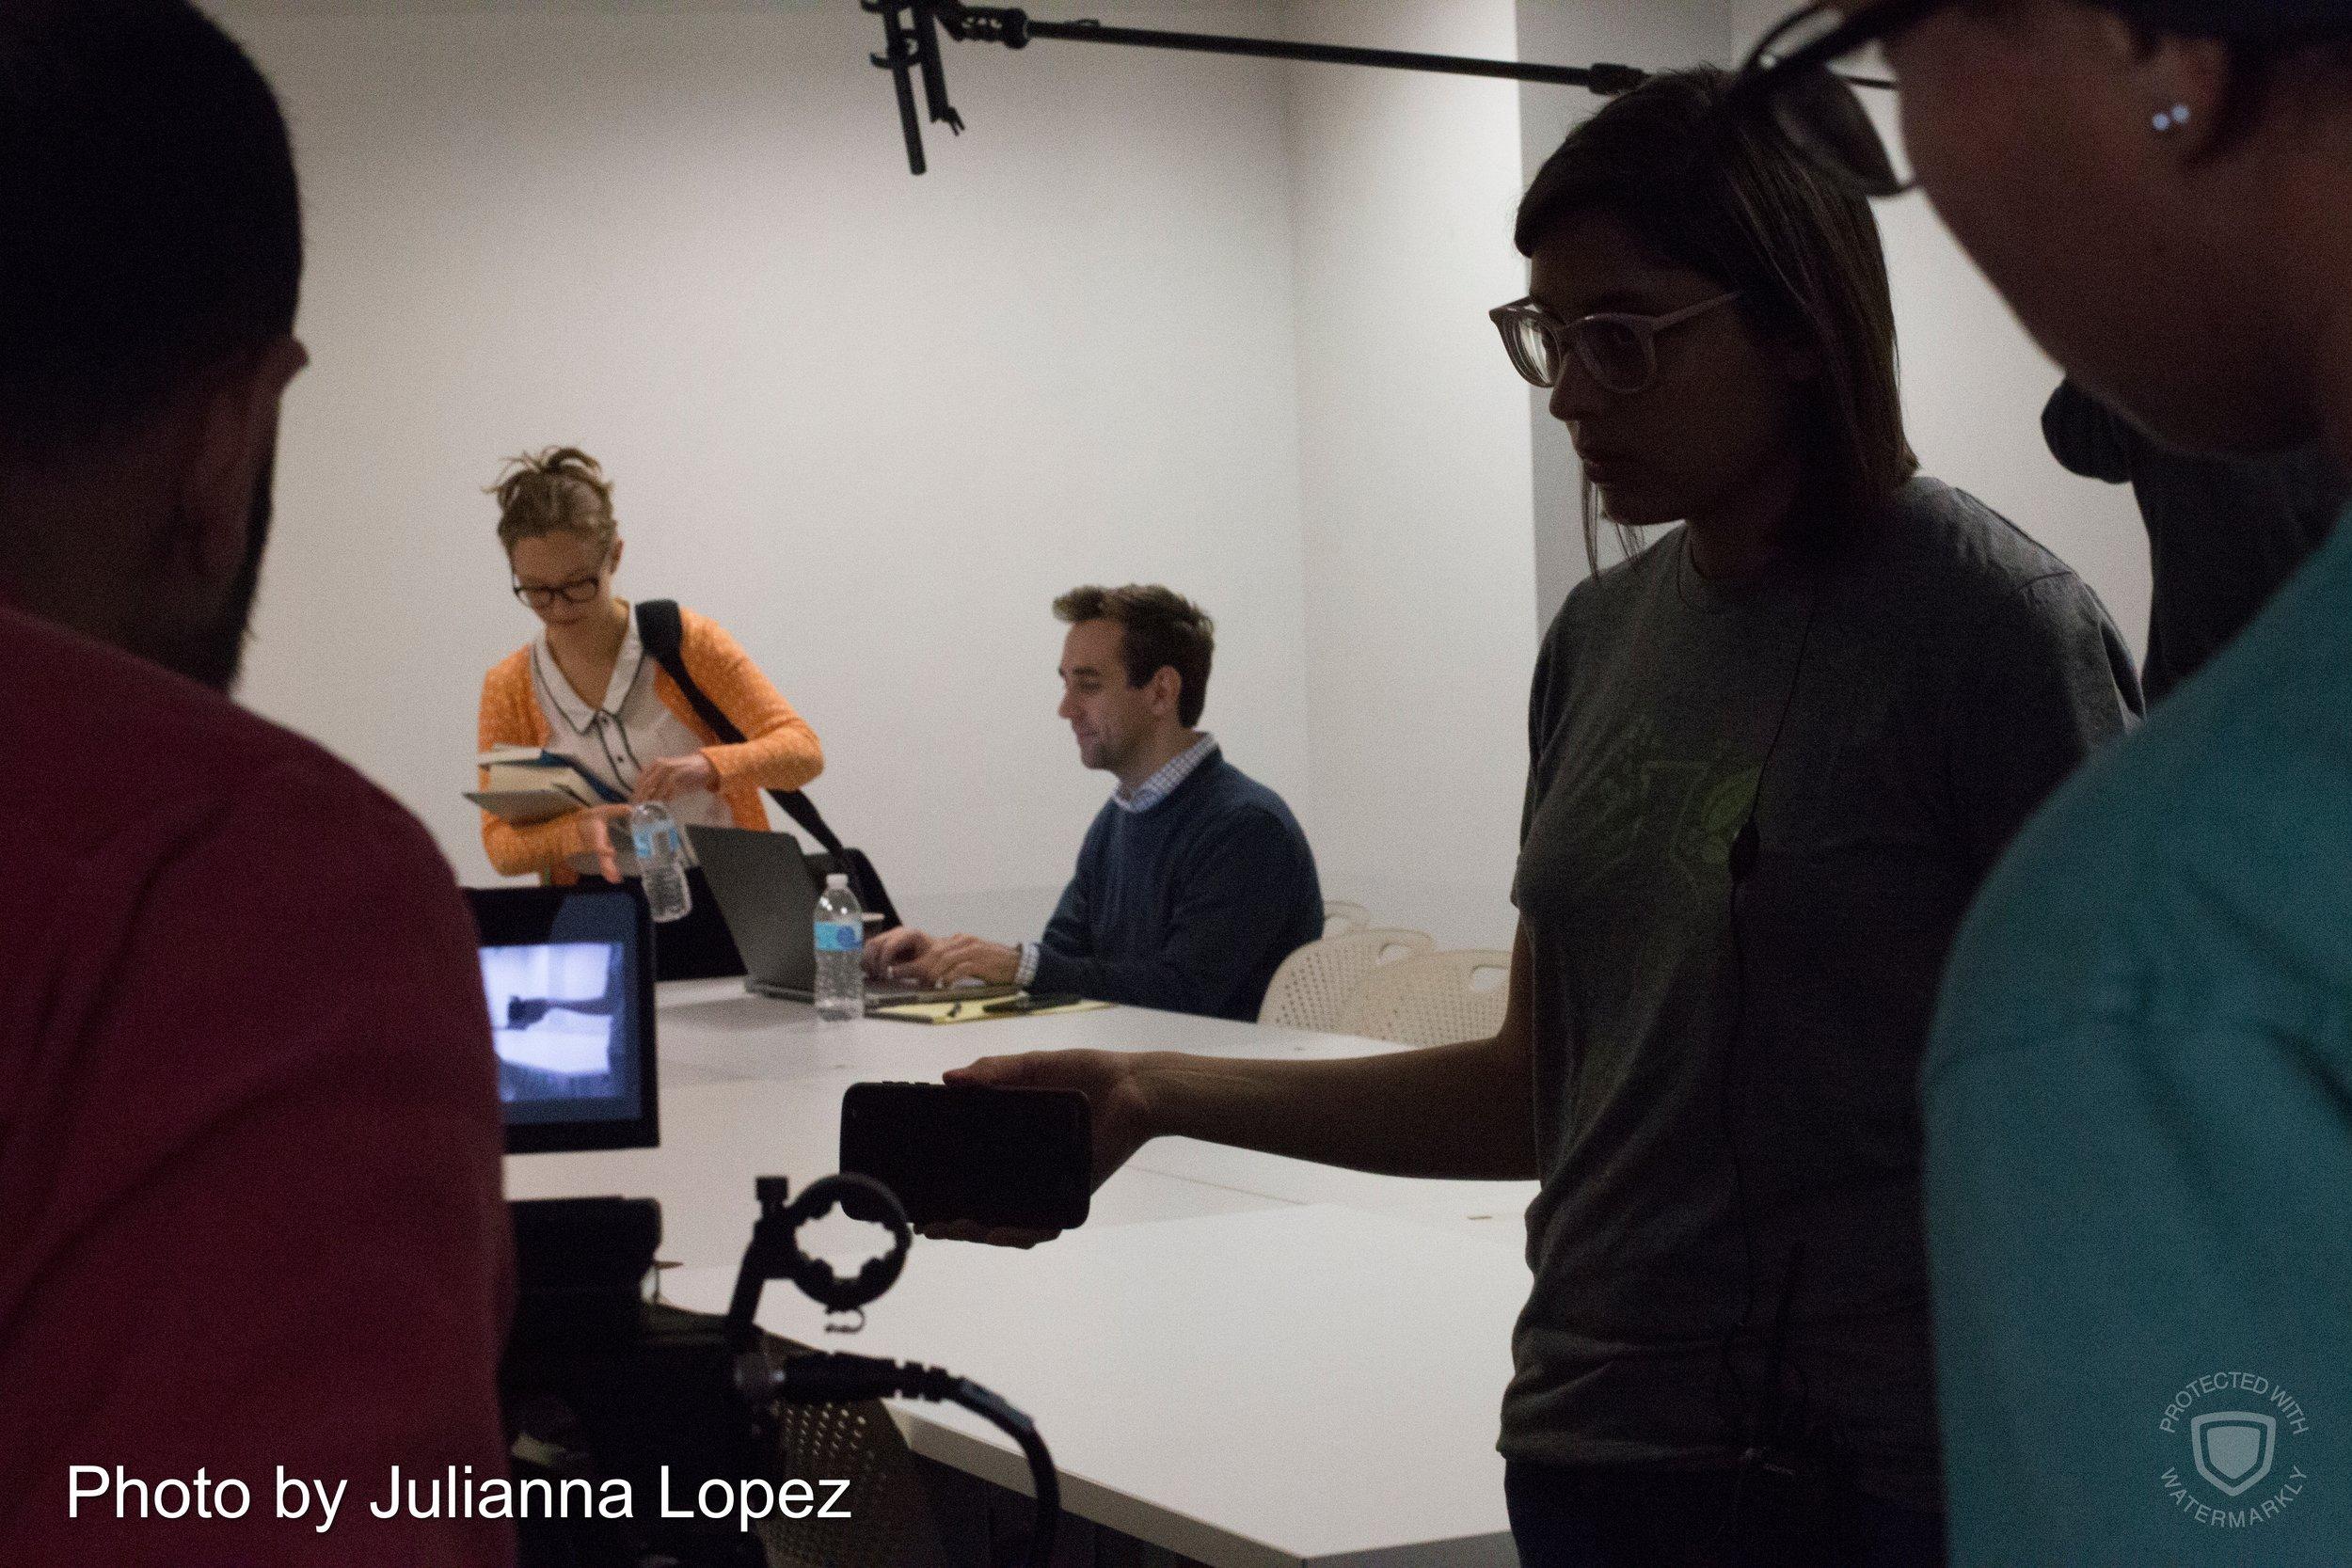 Julianna Lopez - IMG_6280.jpg